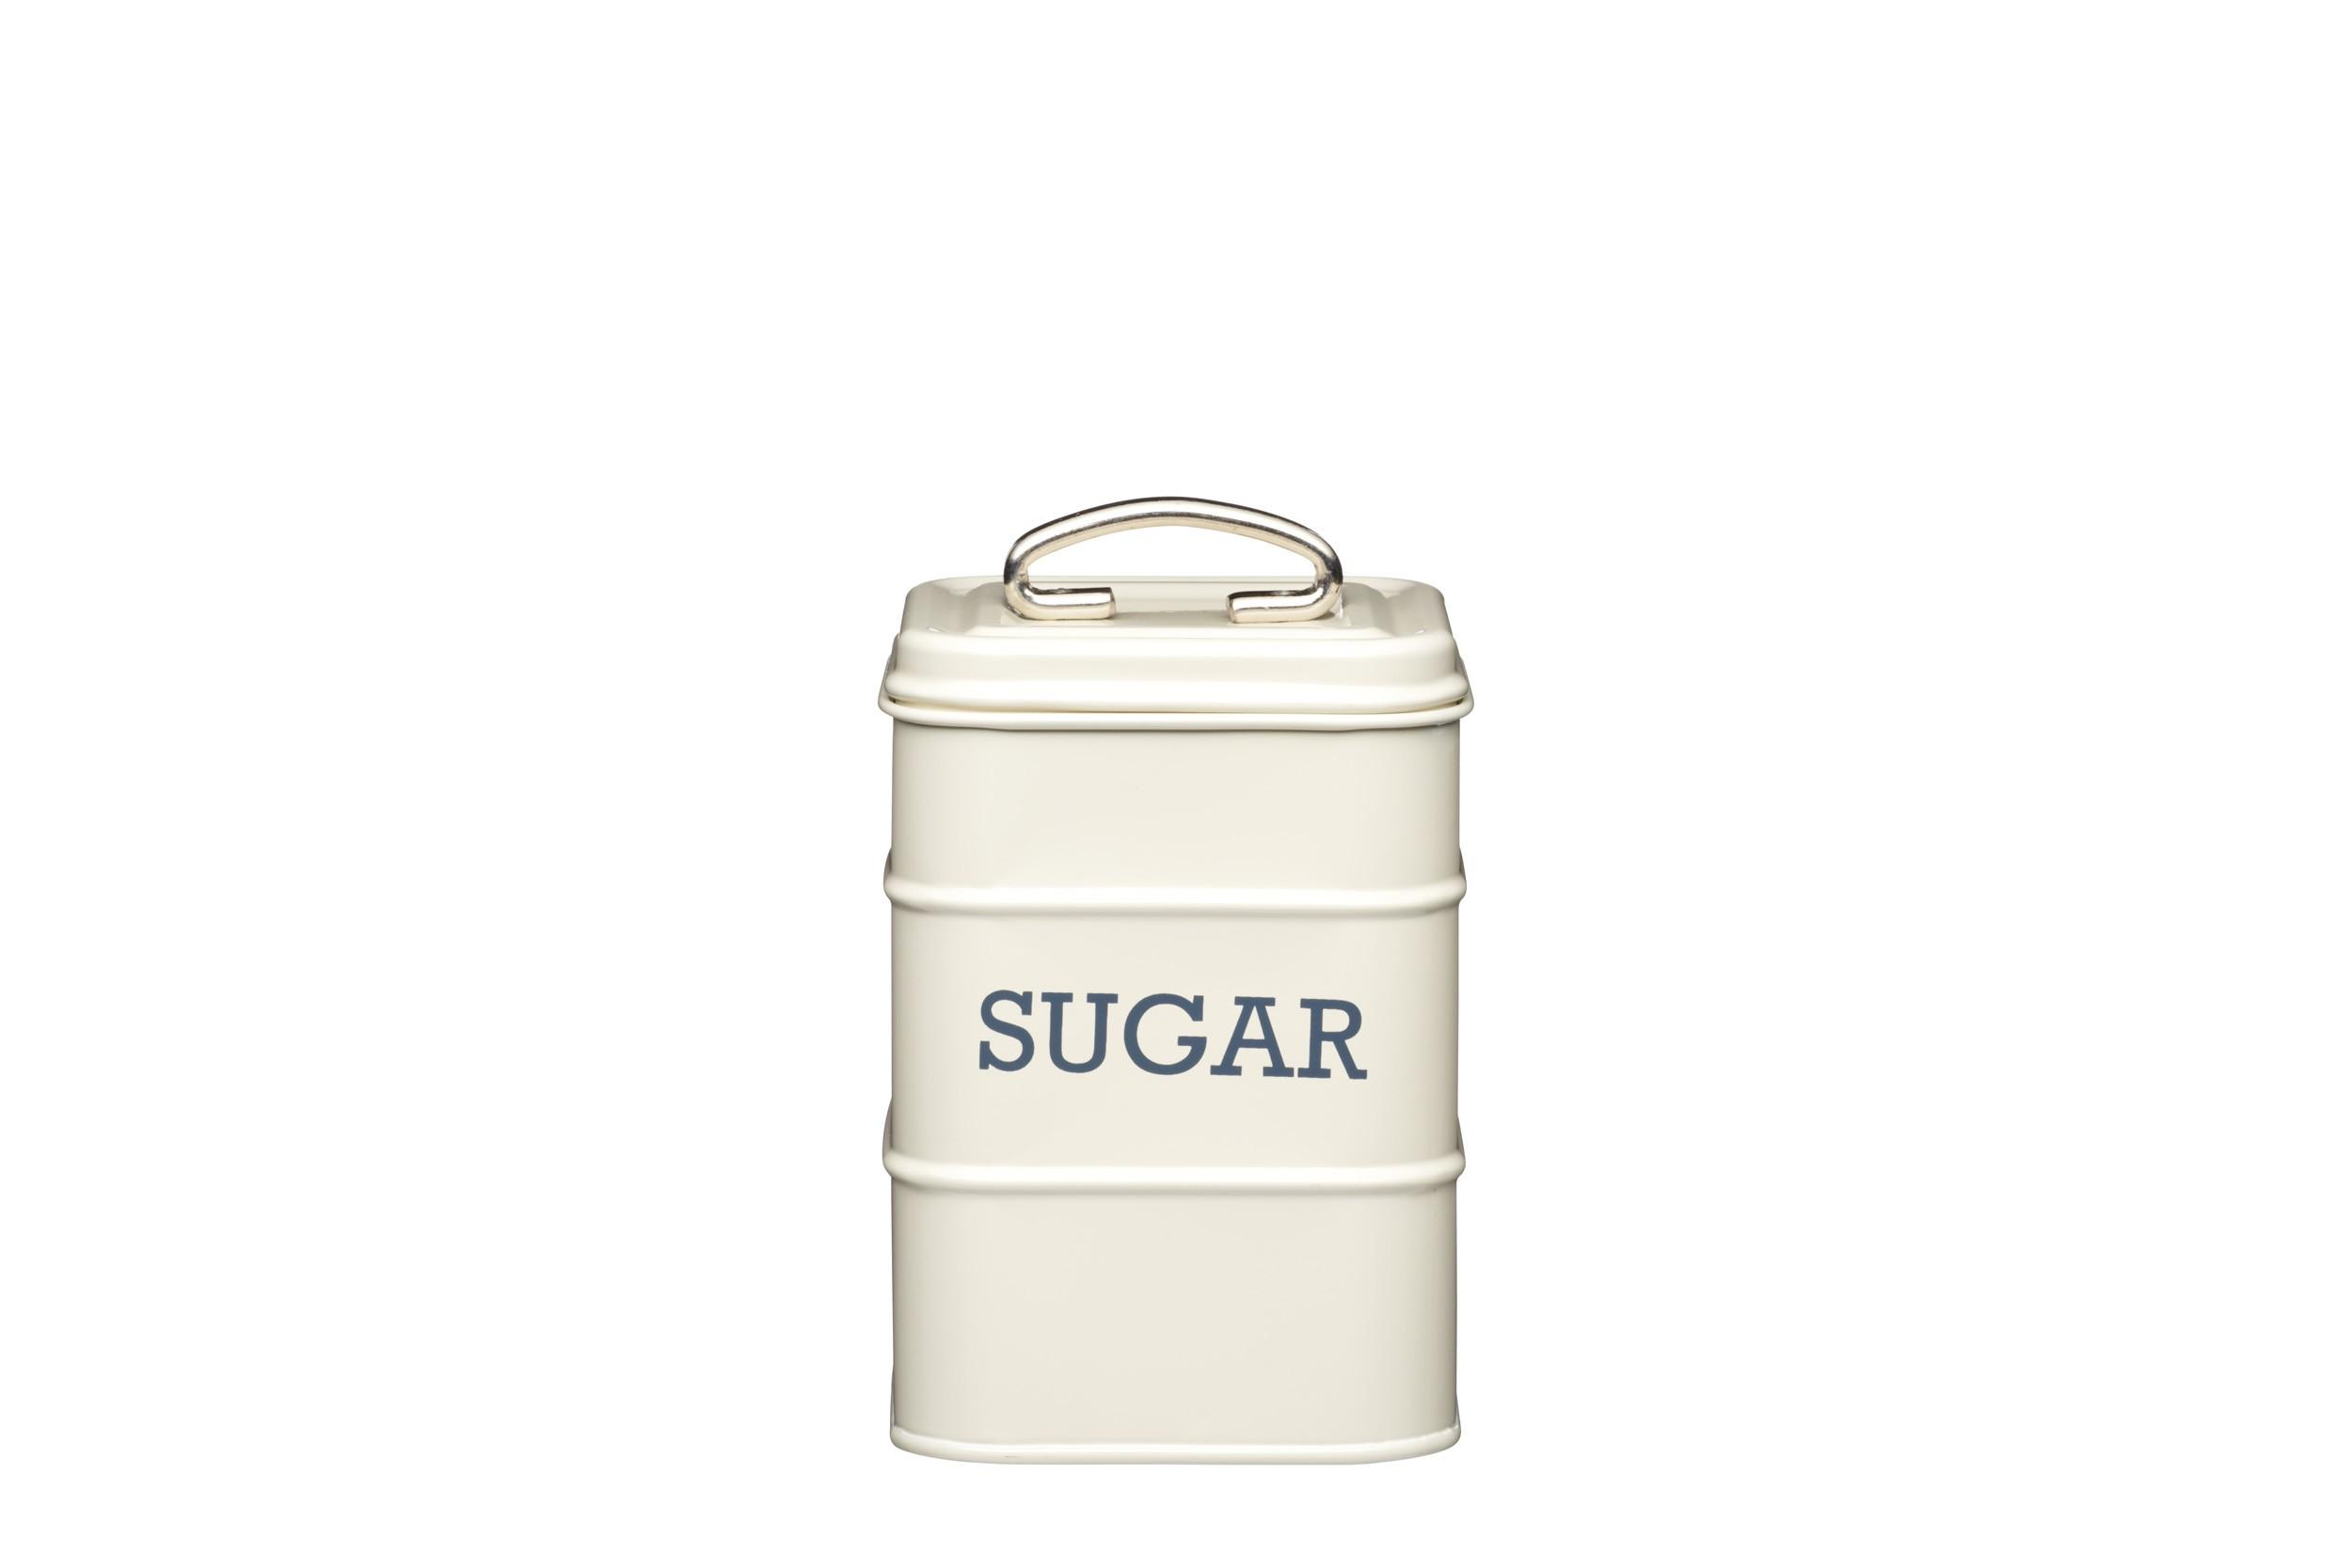 Kitchen Craft Living Nostalgia Sugar Canister Cream 11cm X 17cm